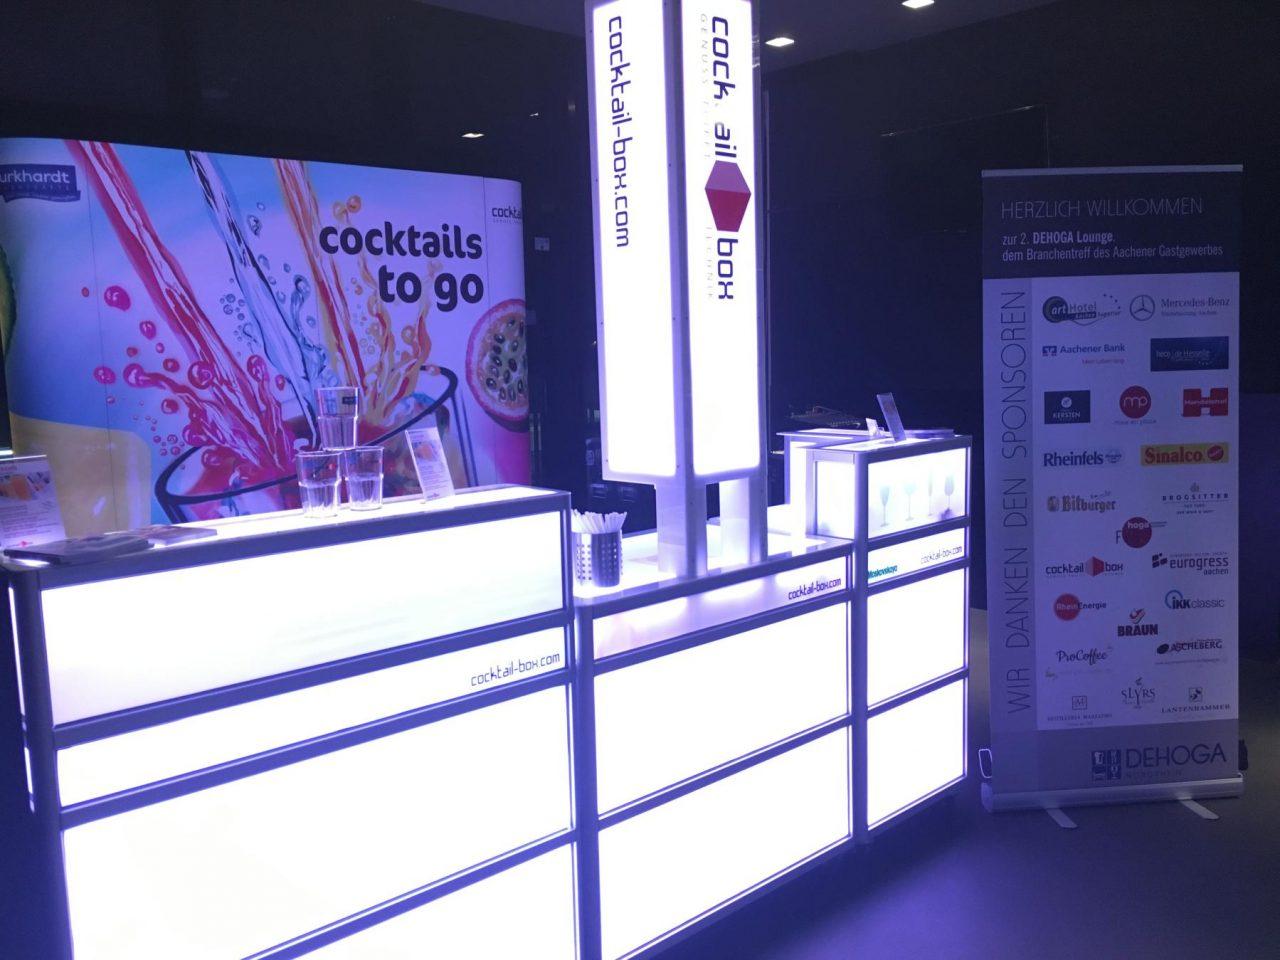 DEHOGA-Aachen-2017-cocktail-box1